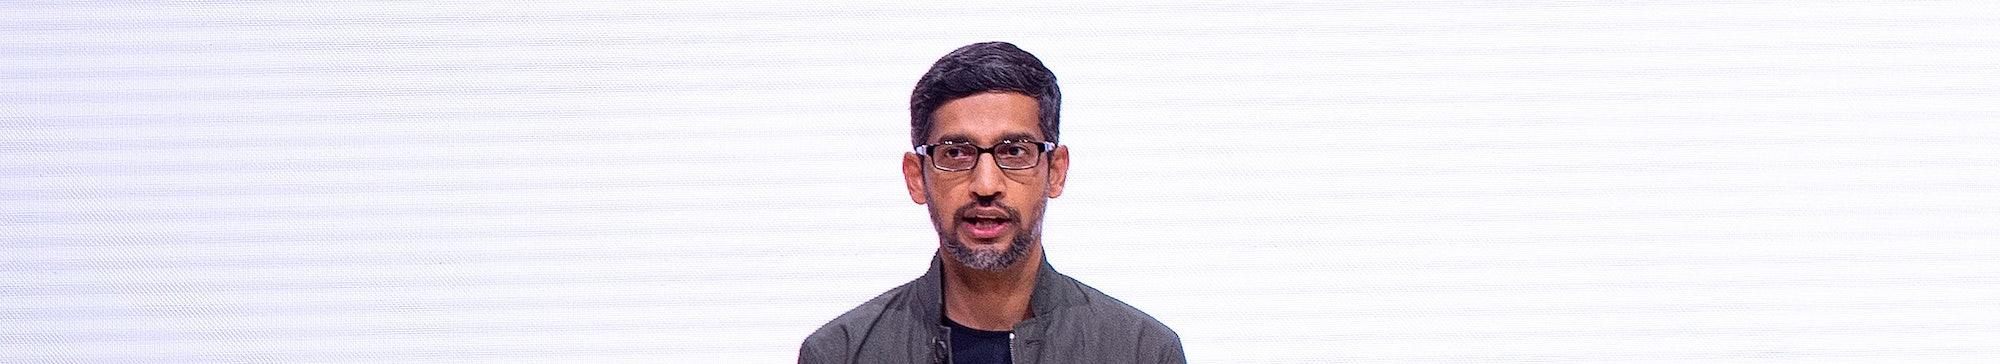 "Google CEO Sundar Pichai in front of the Google ""G"" letter."